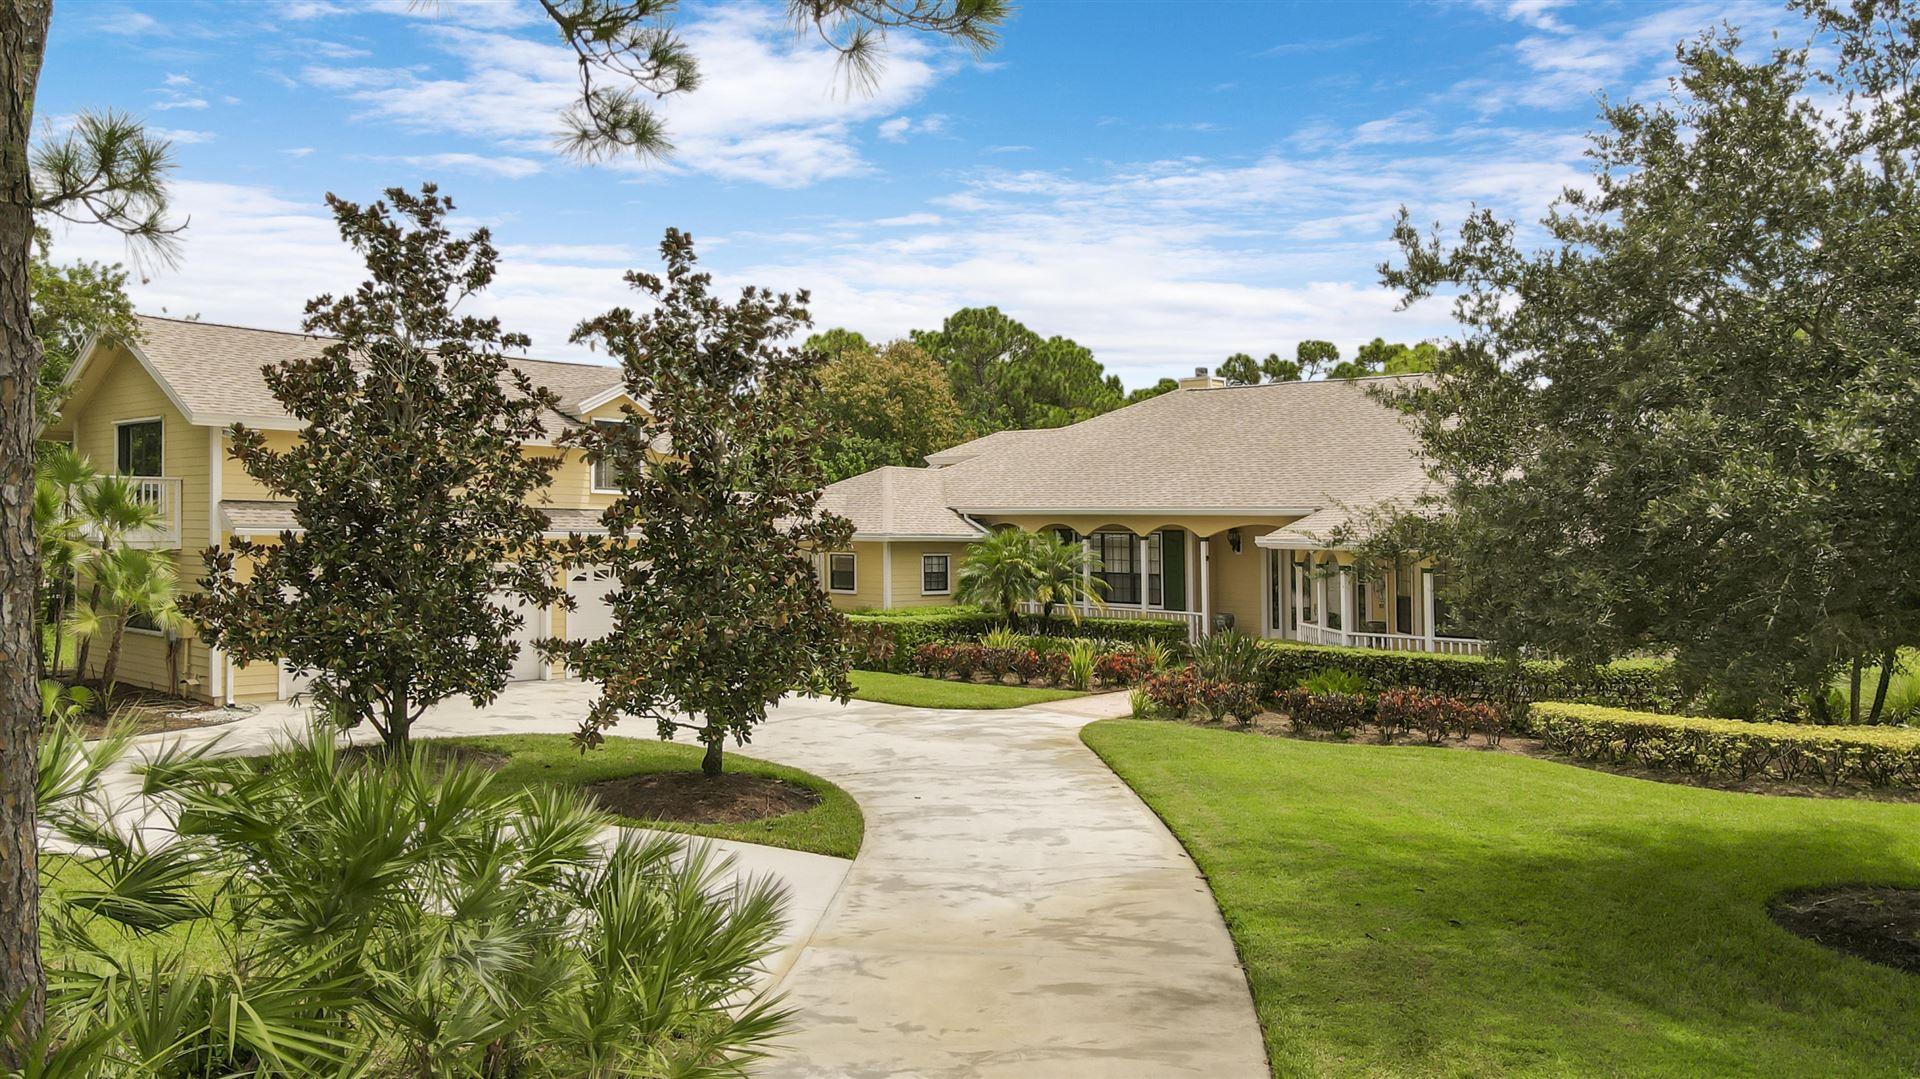 4652 SW Branch Terrace, Palm City, FL 34990 - #: RX-10651896